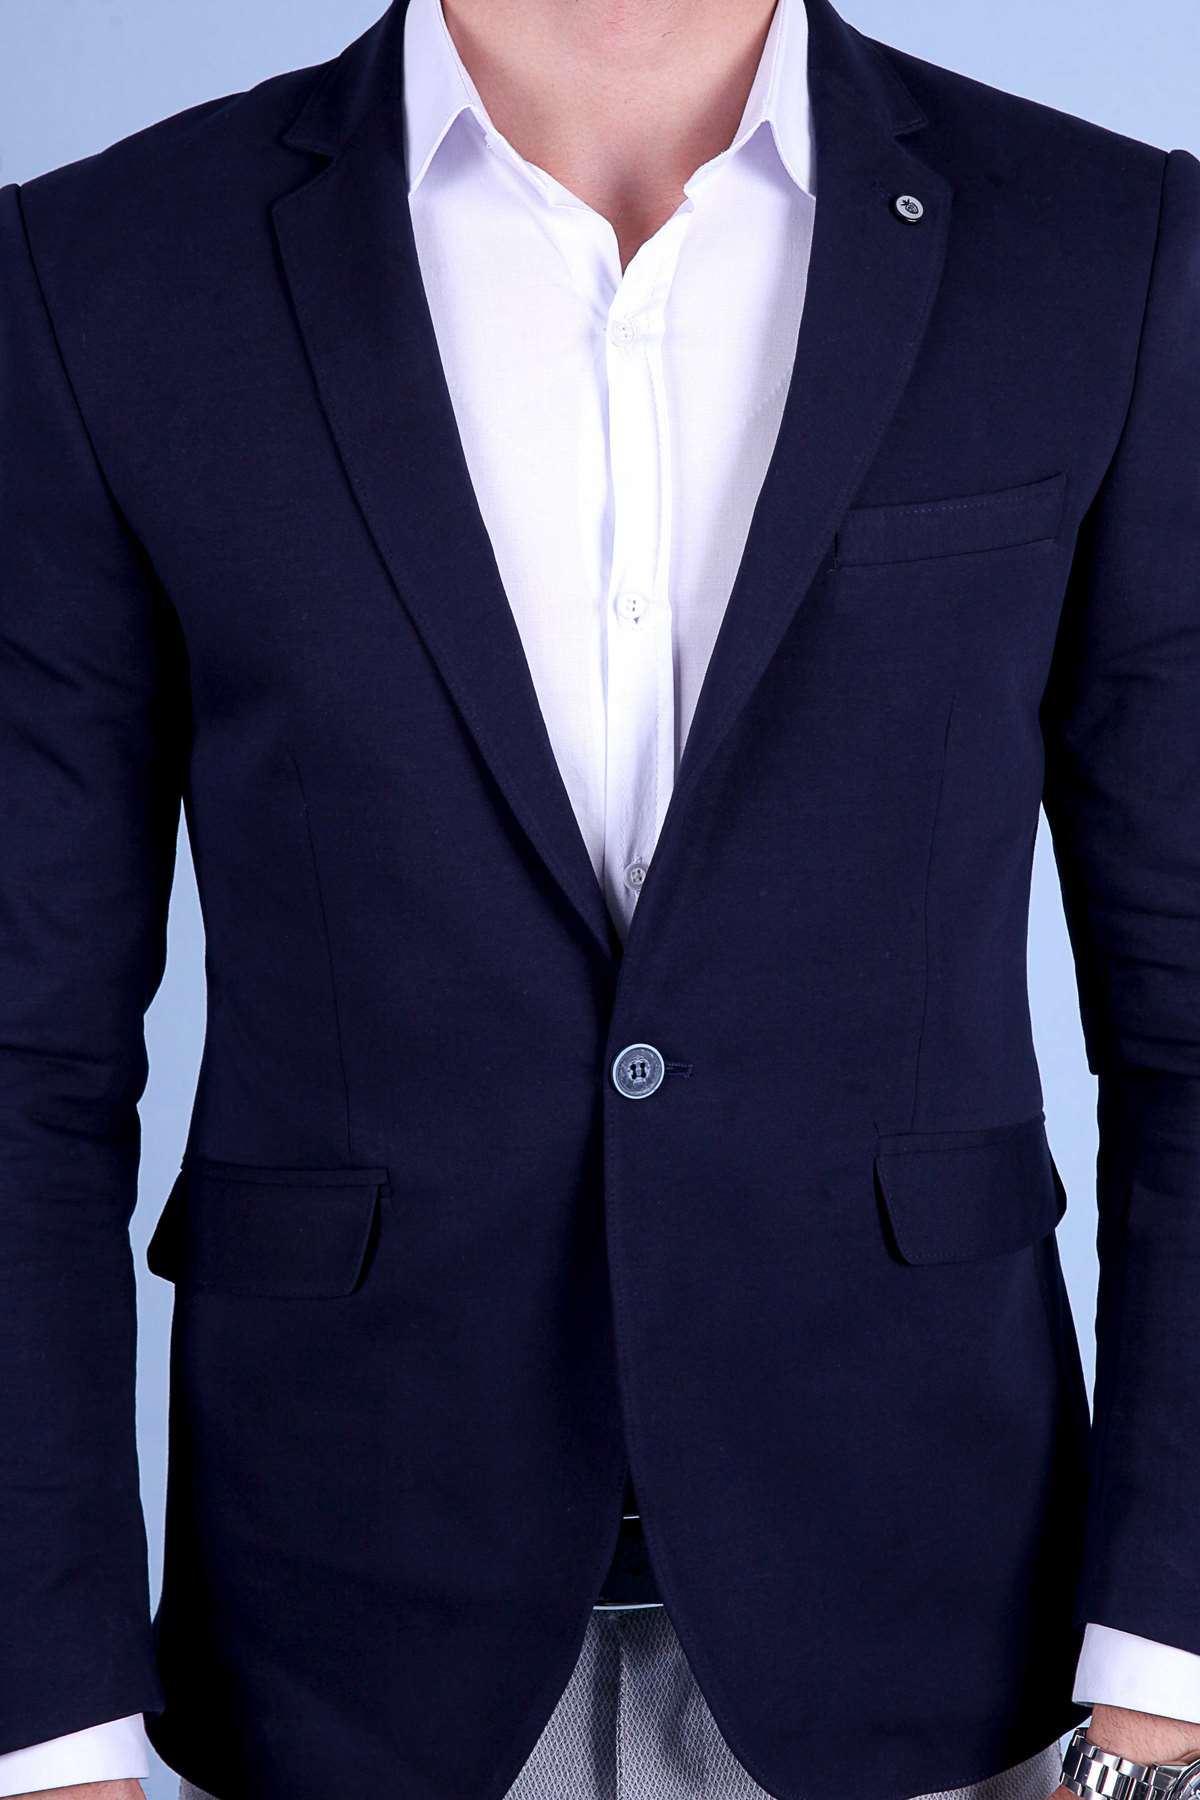 Penye Kumaş Slim Fit Blazer Ceket Lacivert